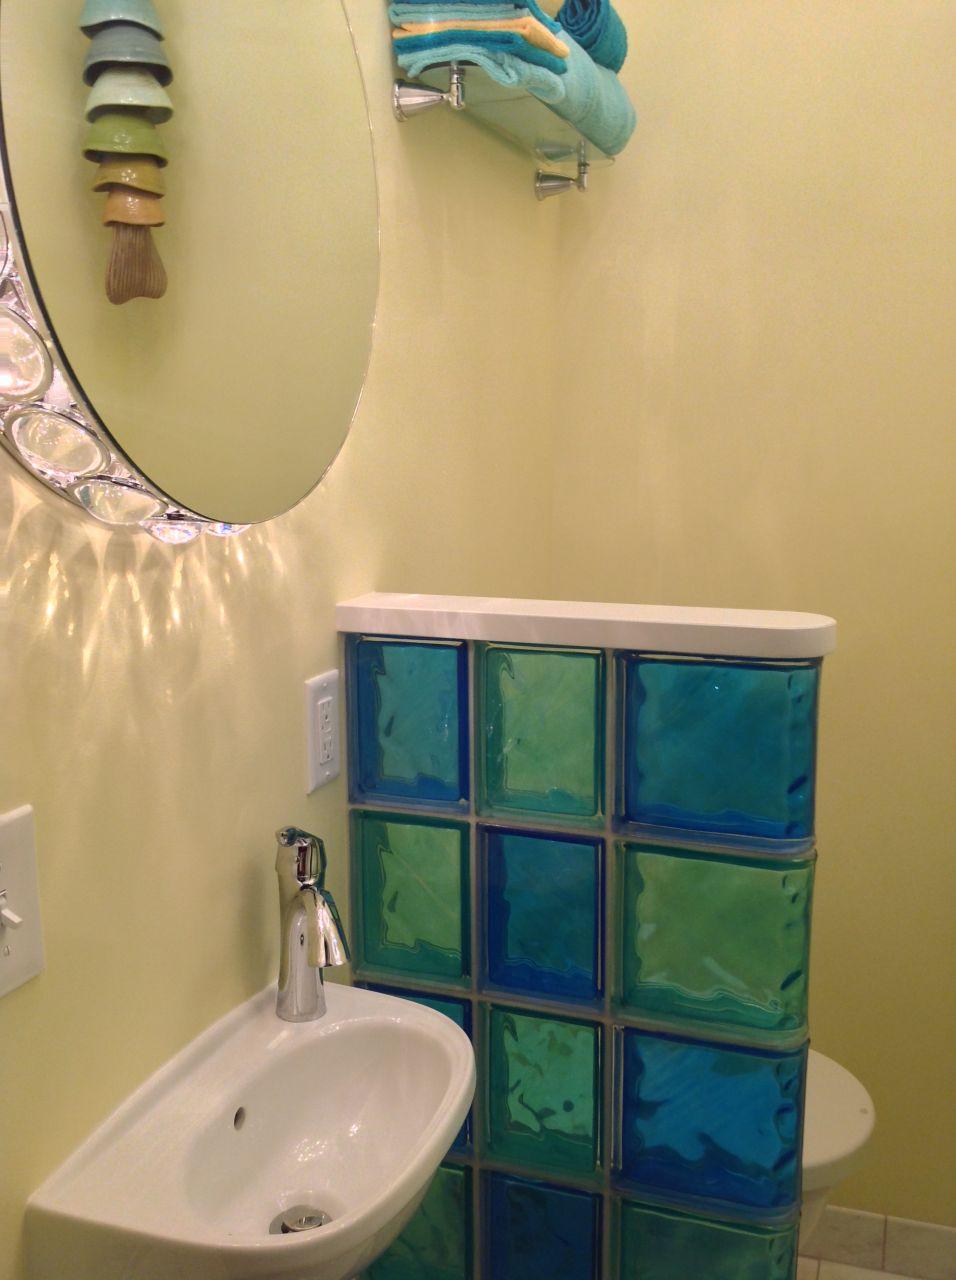 Convert a Closet into a Half Bathroom Condo Bath Remodeling Cleveland Heights Ohio